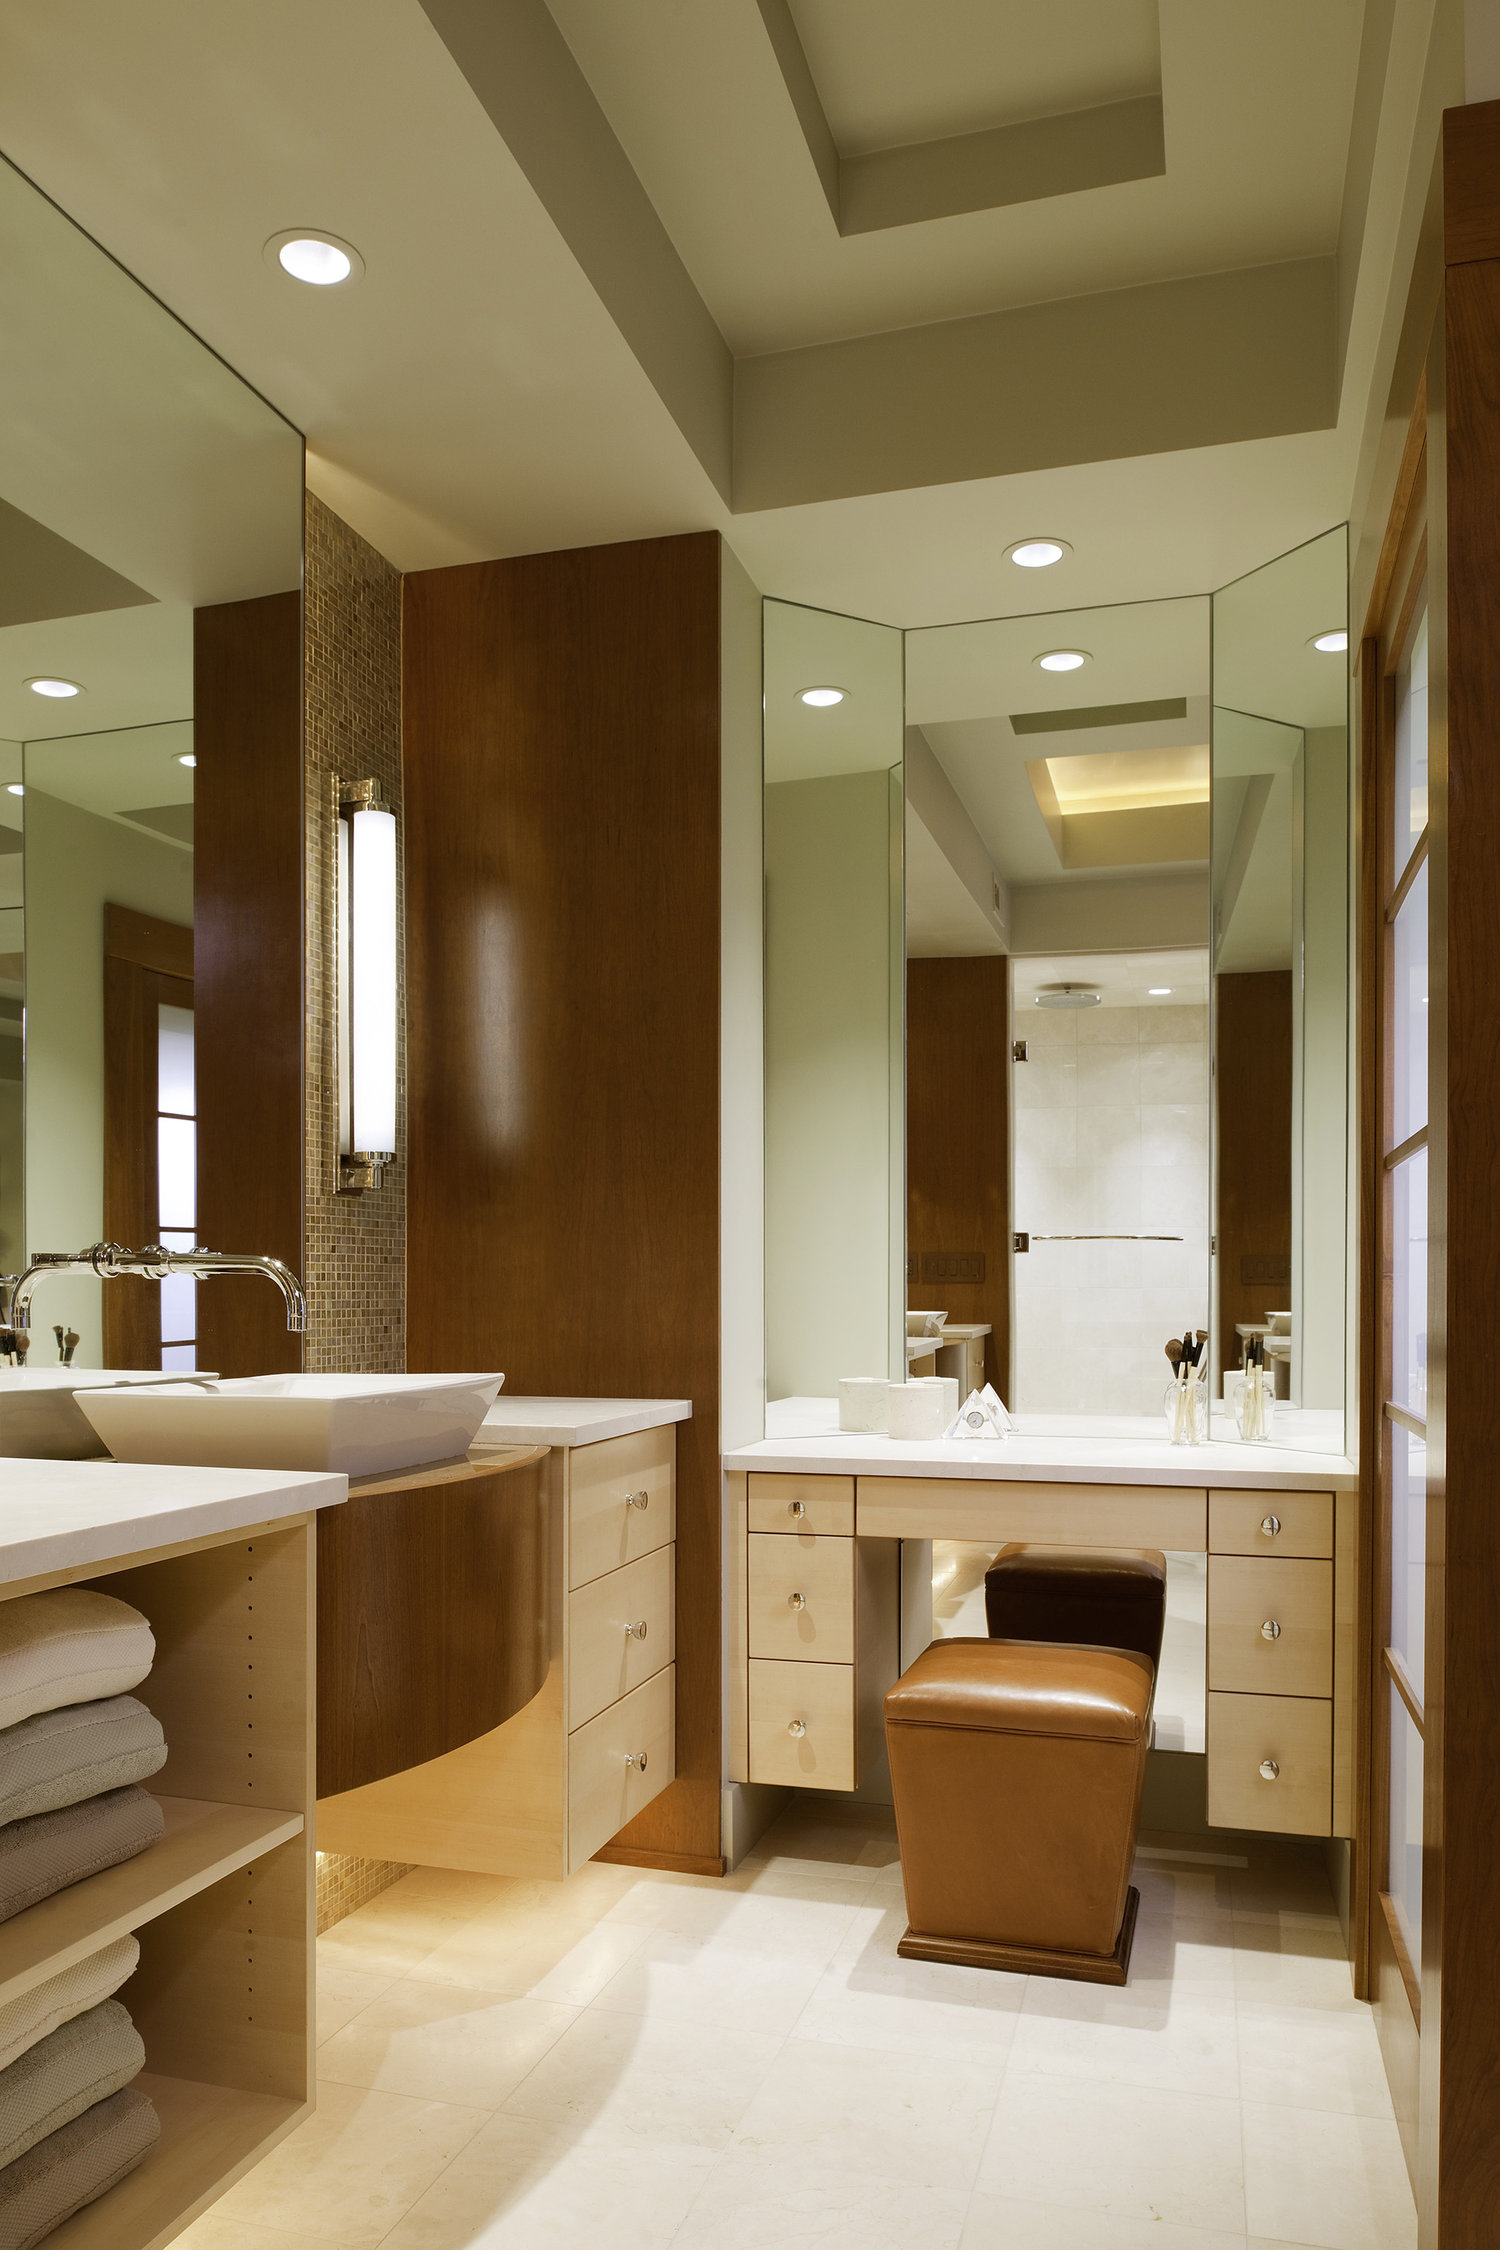 kitchen_bath_concepts_wholehome5_3.jpg